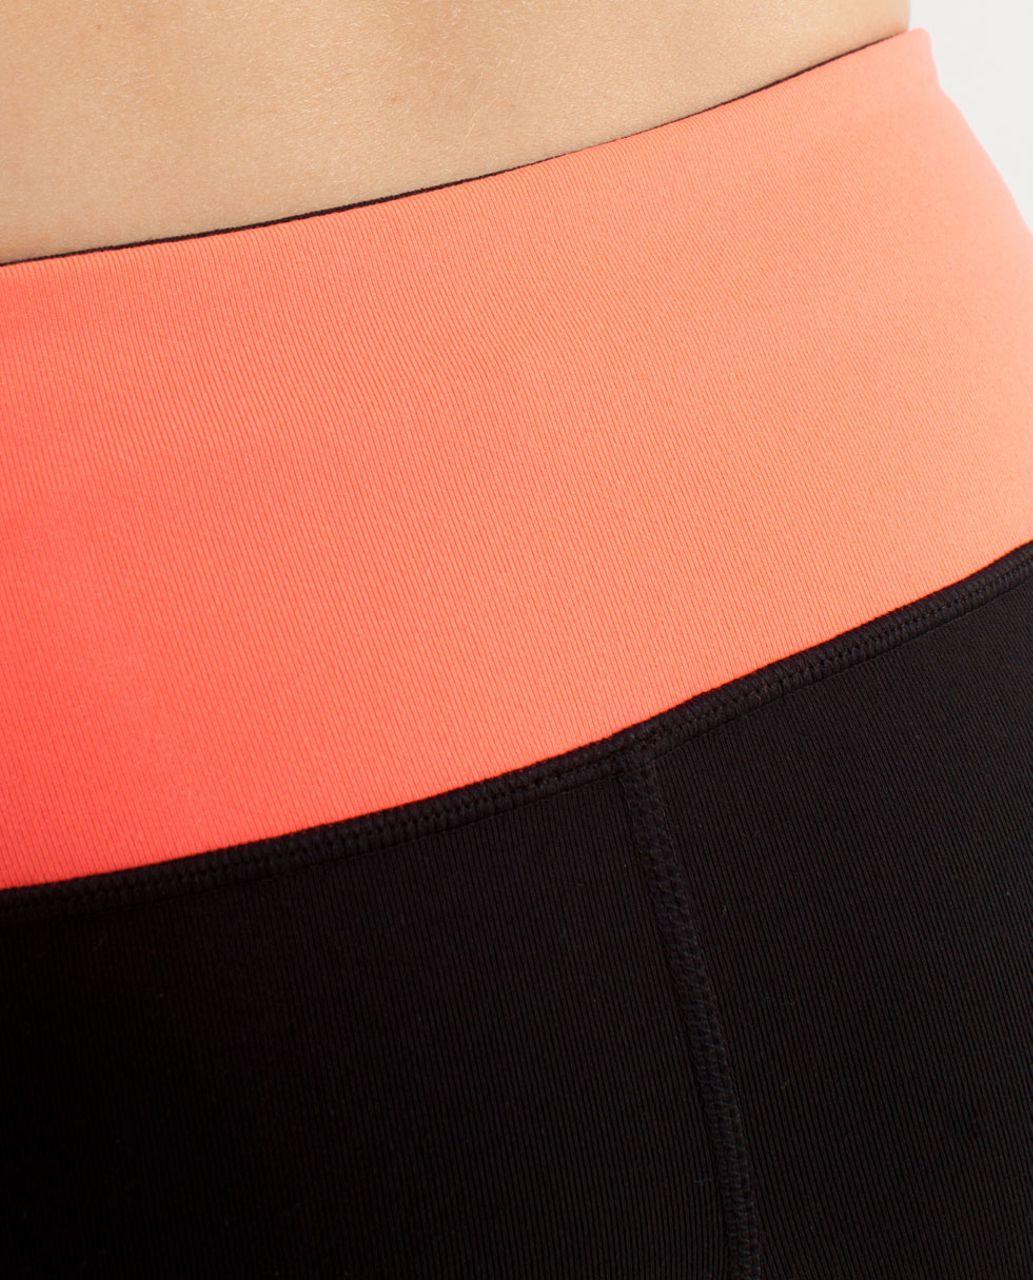 Lululemon Boogie Short - Black / Electric Orange